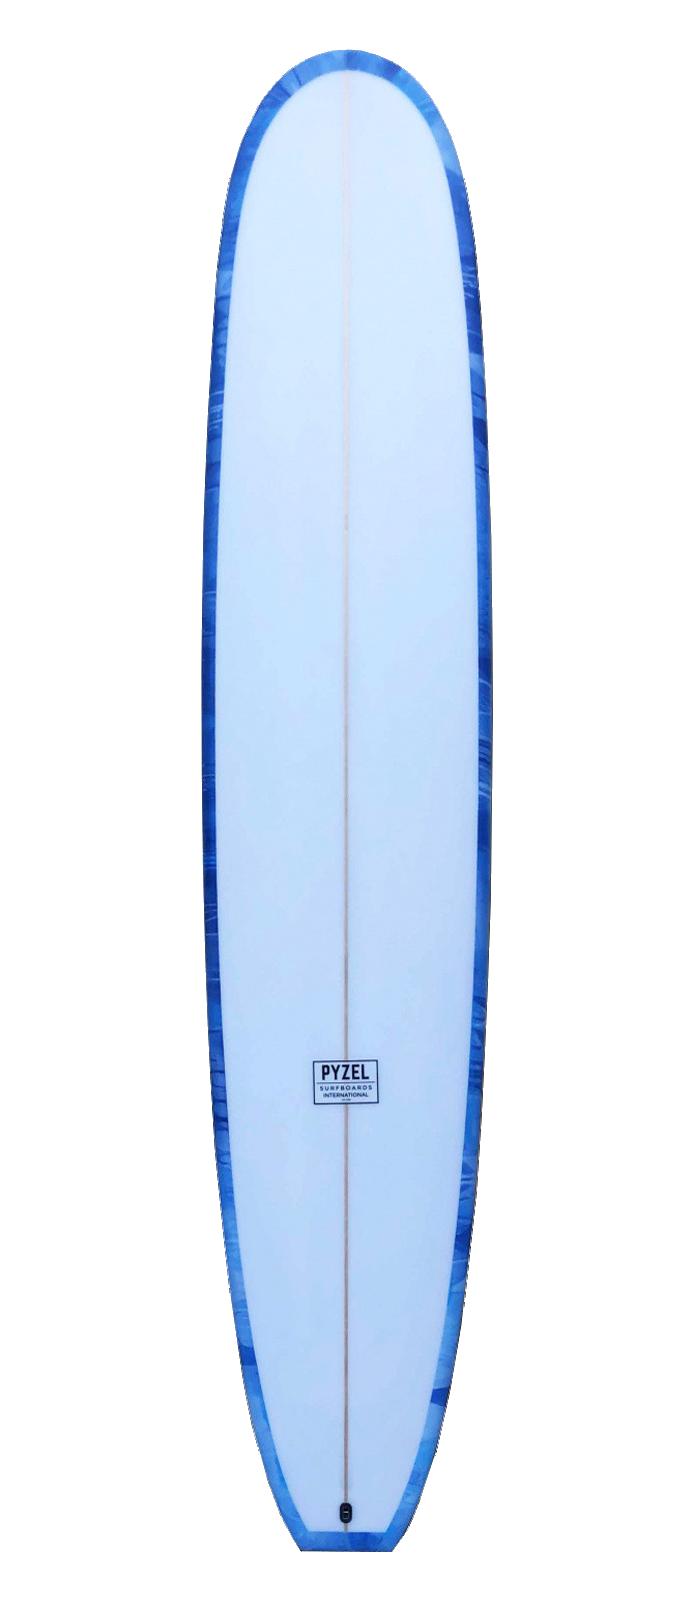 LOG surfboard model